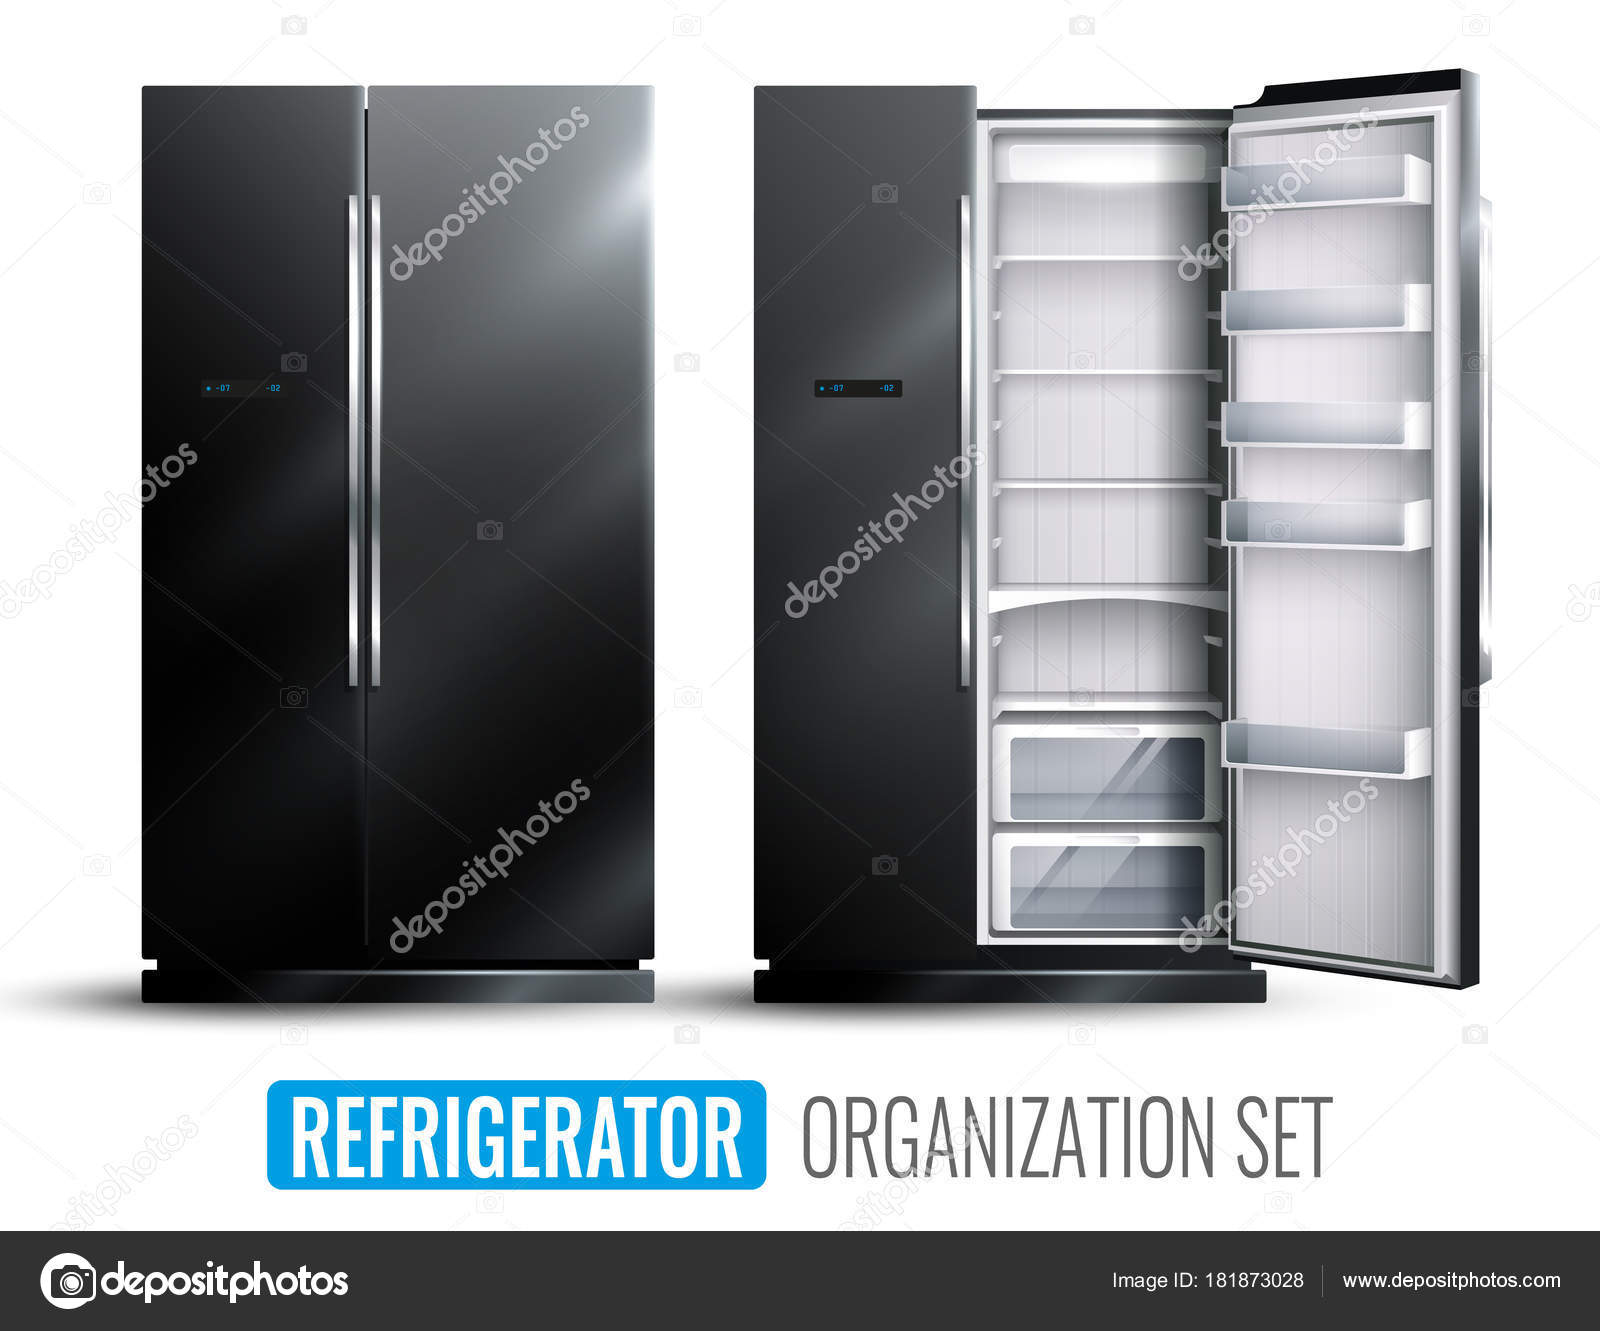 Kühlschrank Quadratisch : Kühlschrank organisation monochrome set u2014 stockvektor © macrovector